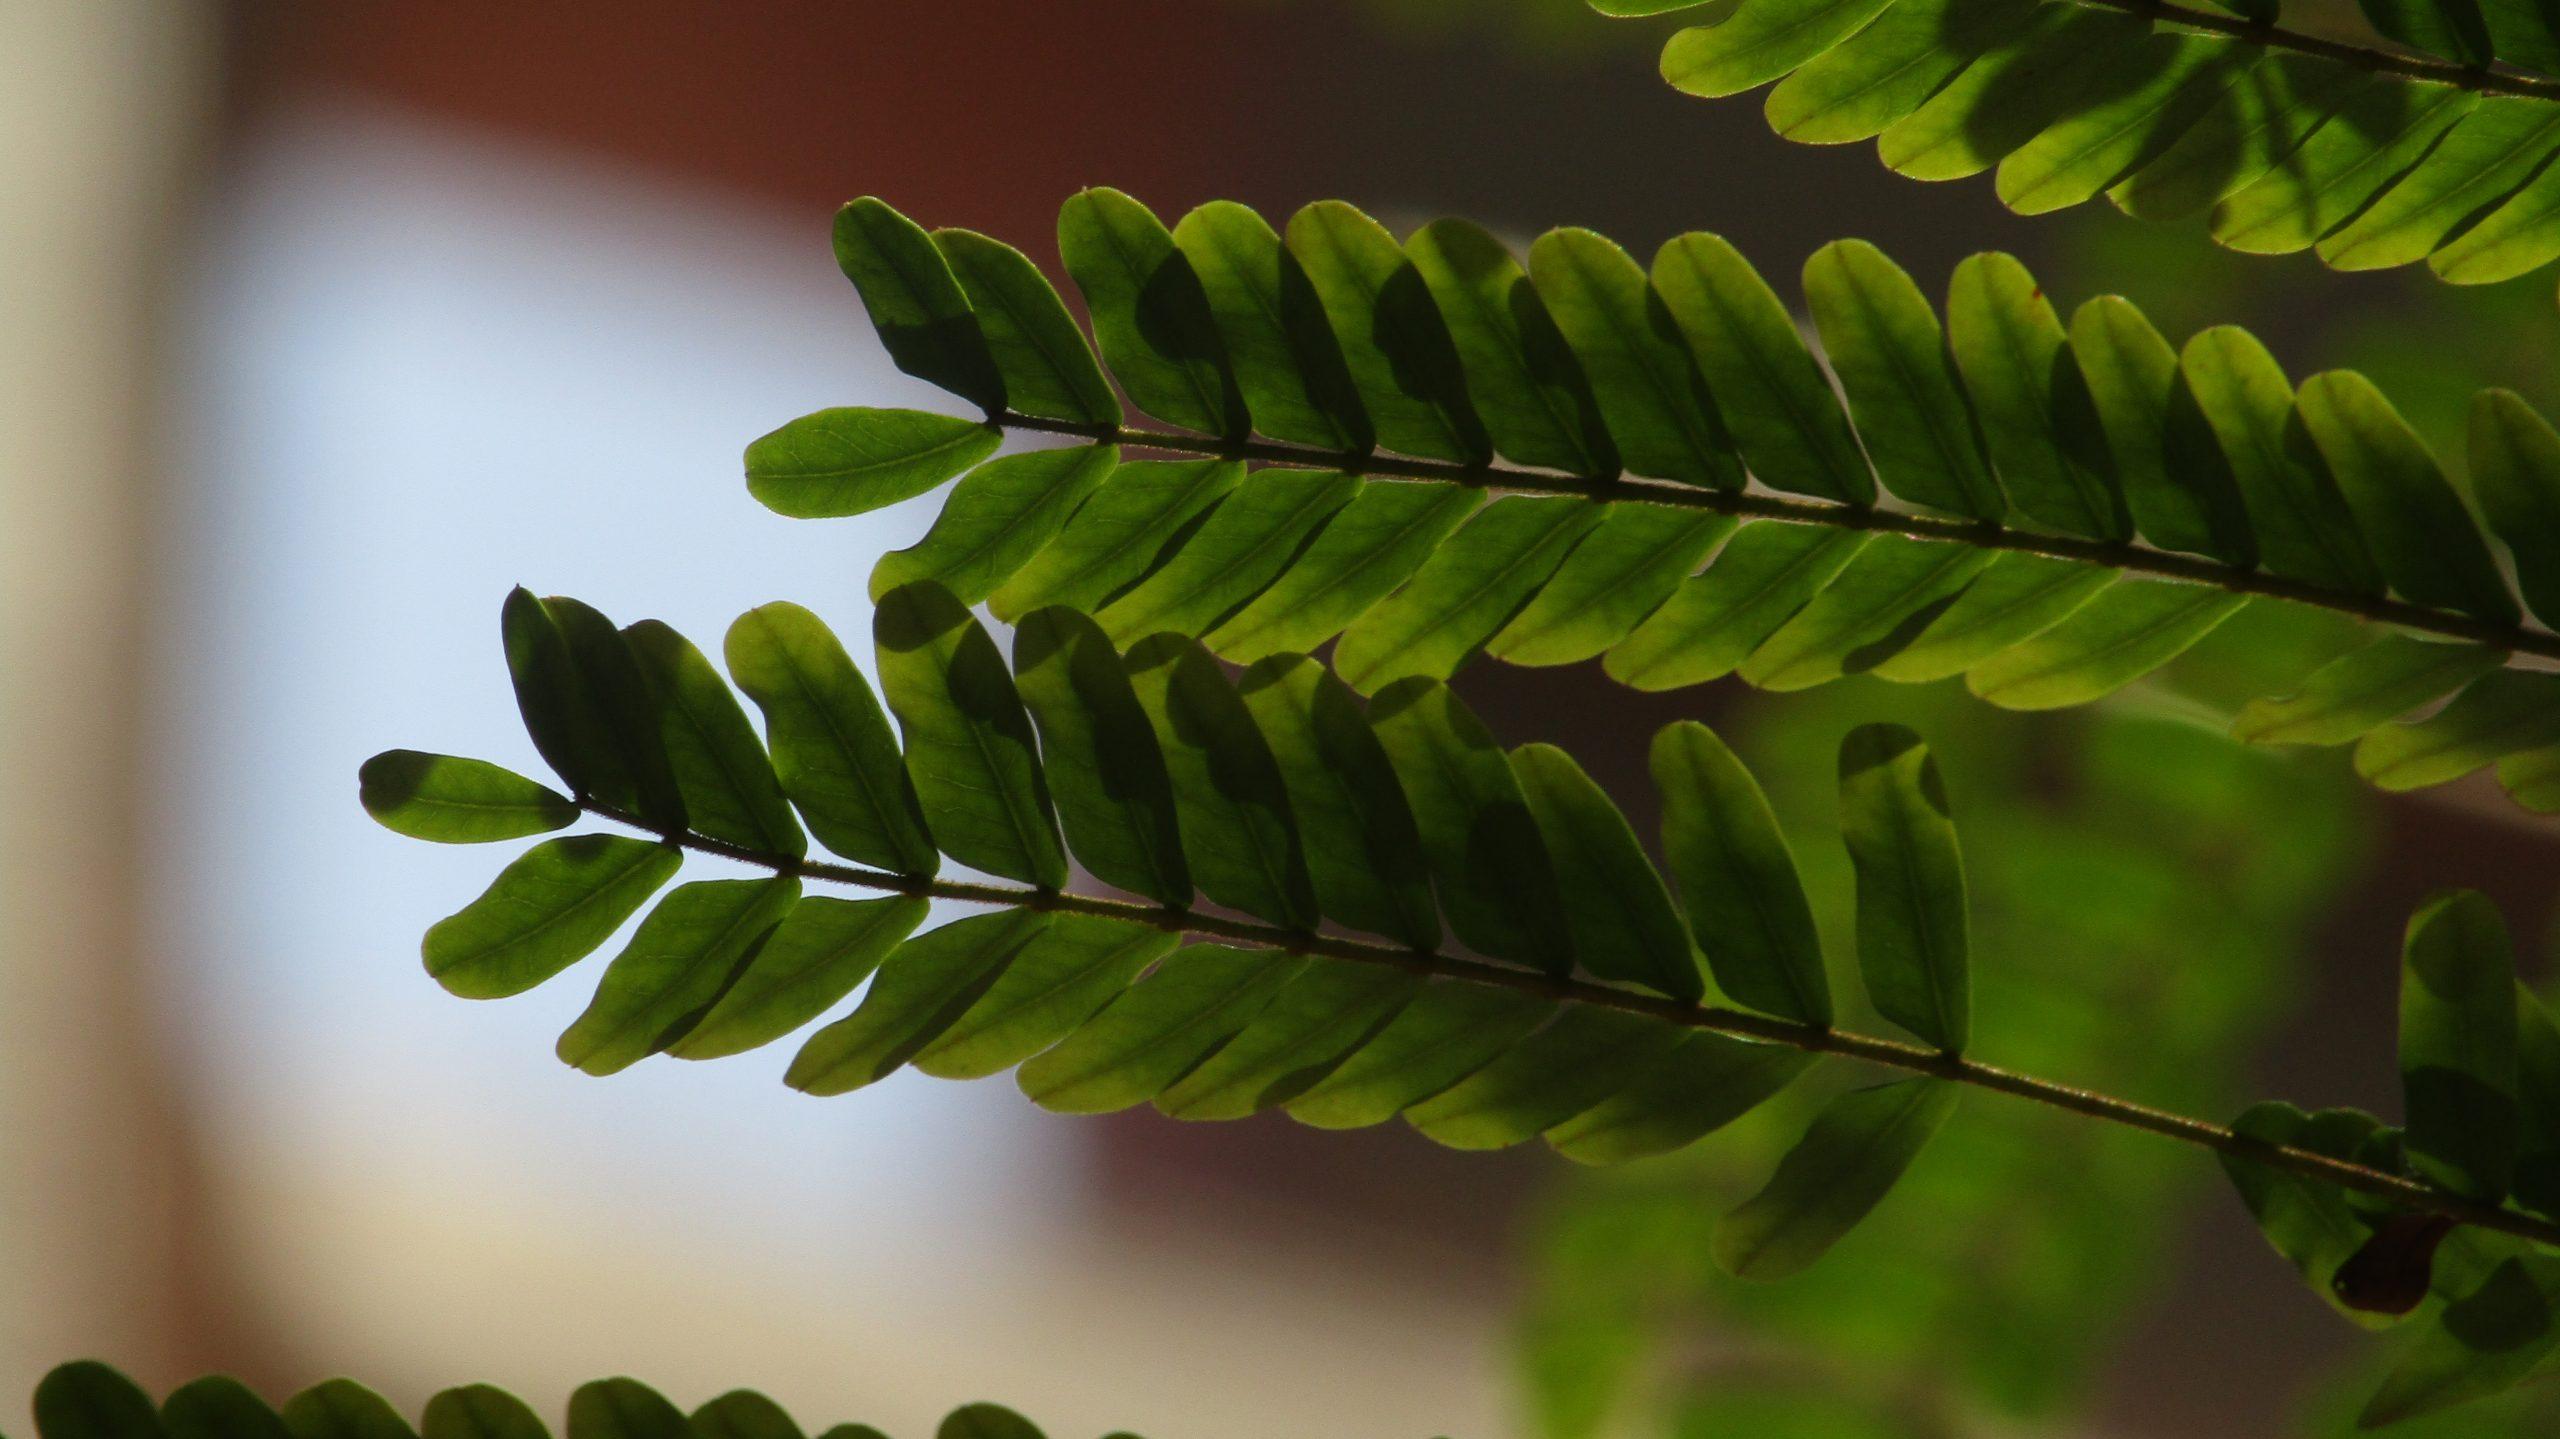 Moringa leafs.